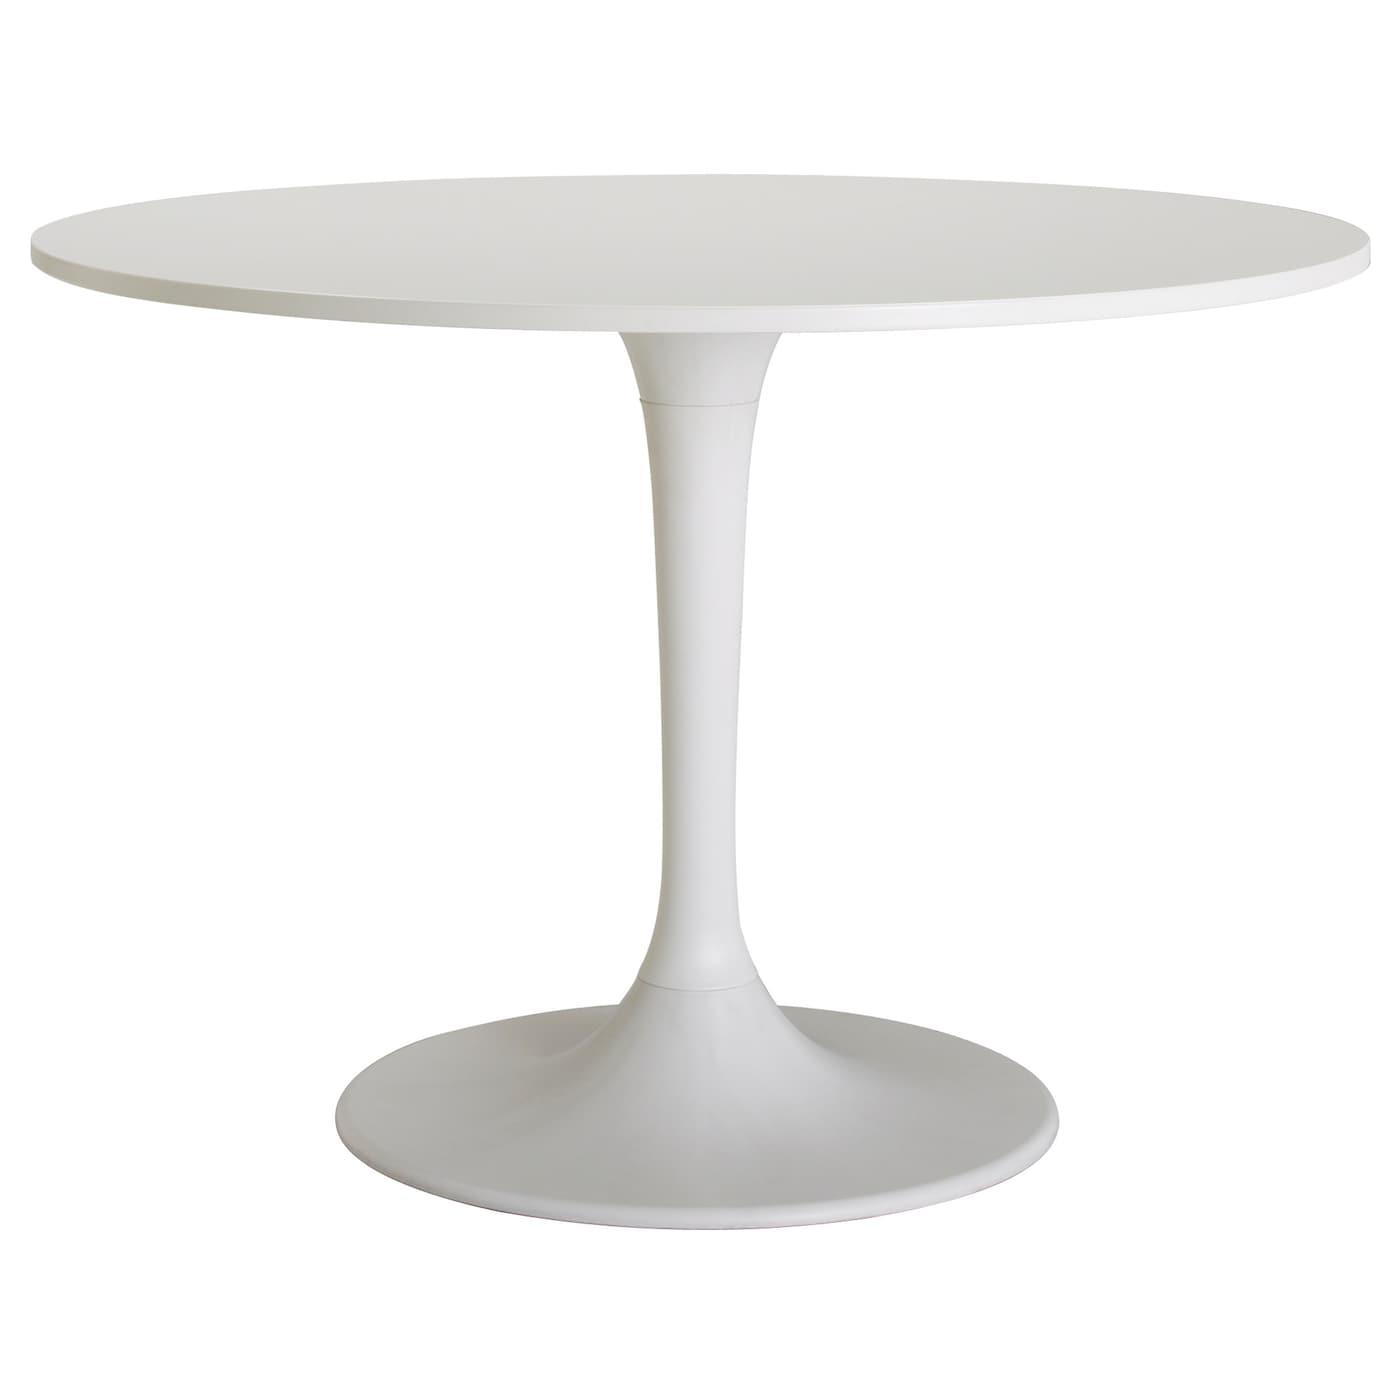 Docksta table blanc 105 cm ikea for Table ikea 5 99